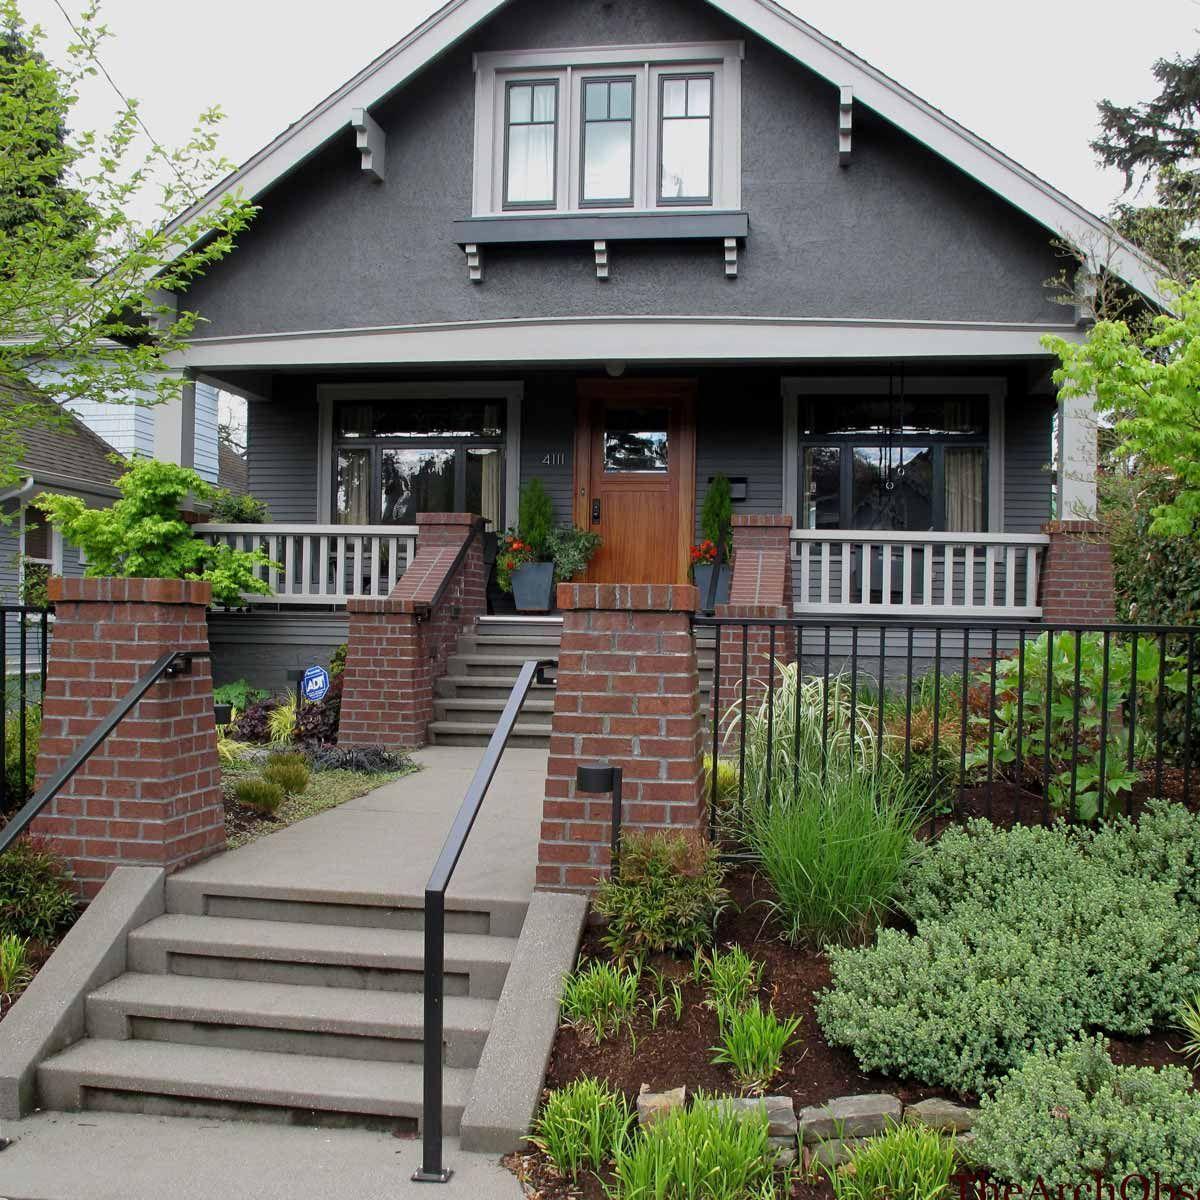 Brick Home Exterior Color Schemes: Exterior House Colors, Red